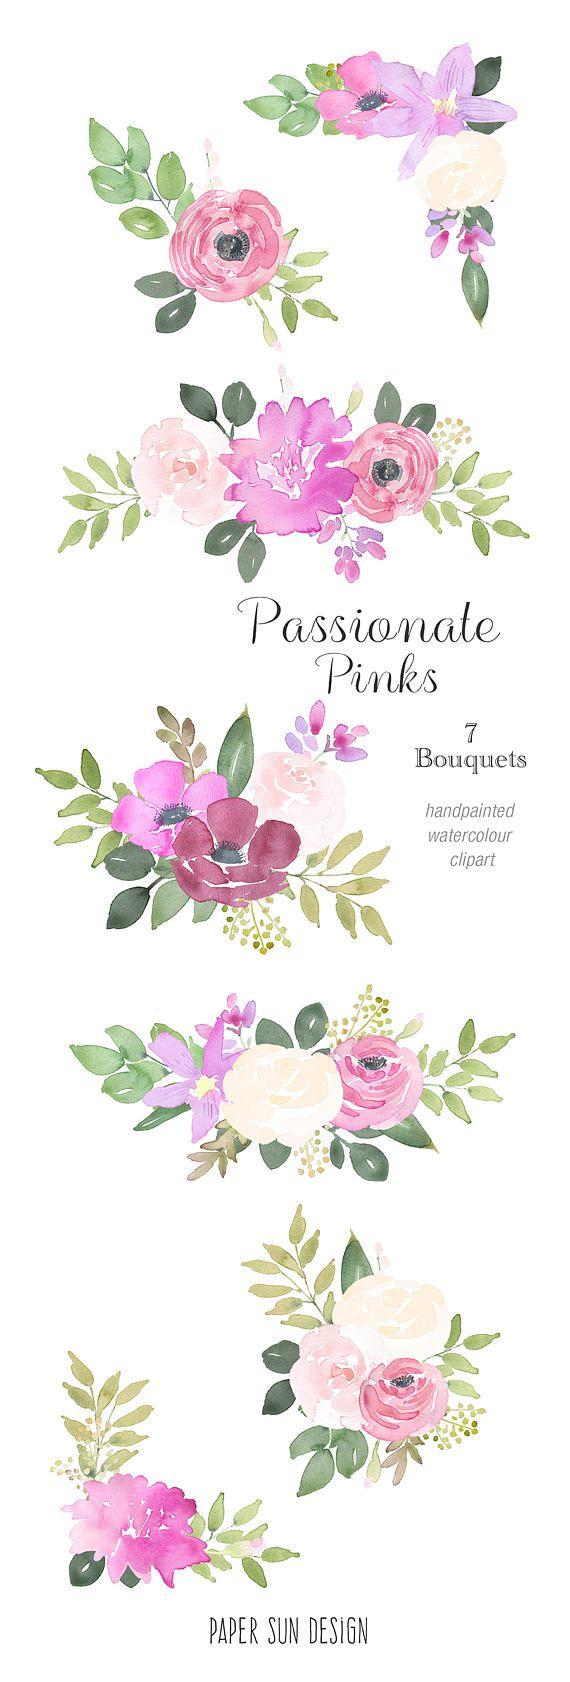 Watercolour Flower Clipart 7 Bouquets Pink Rose